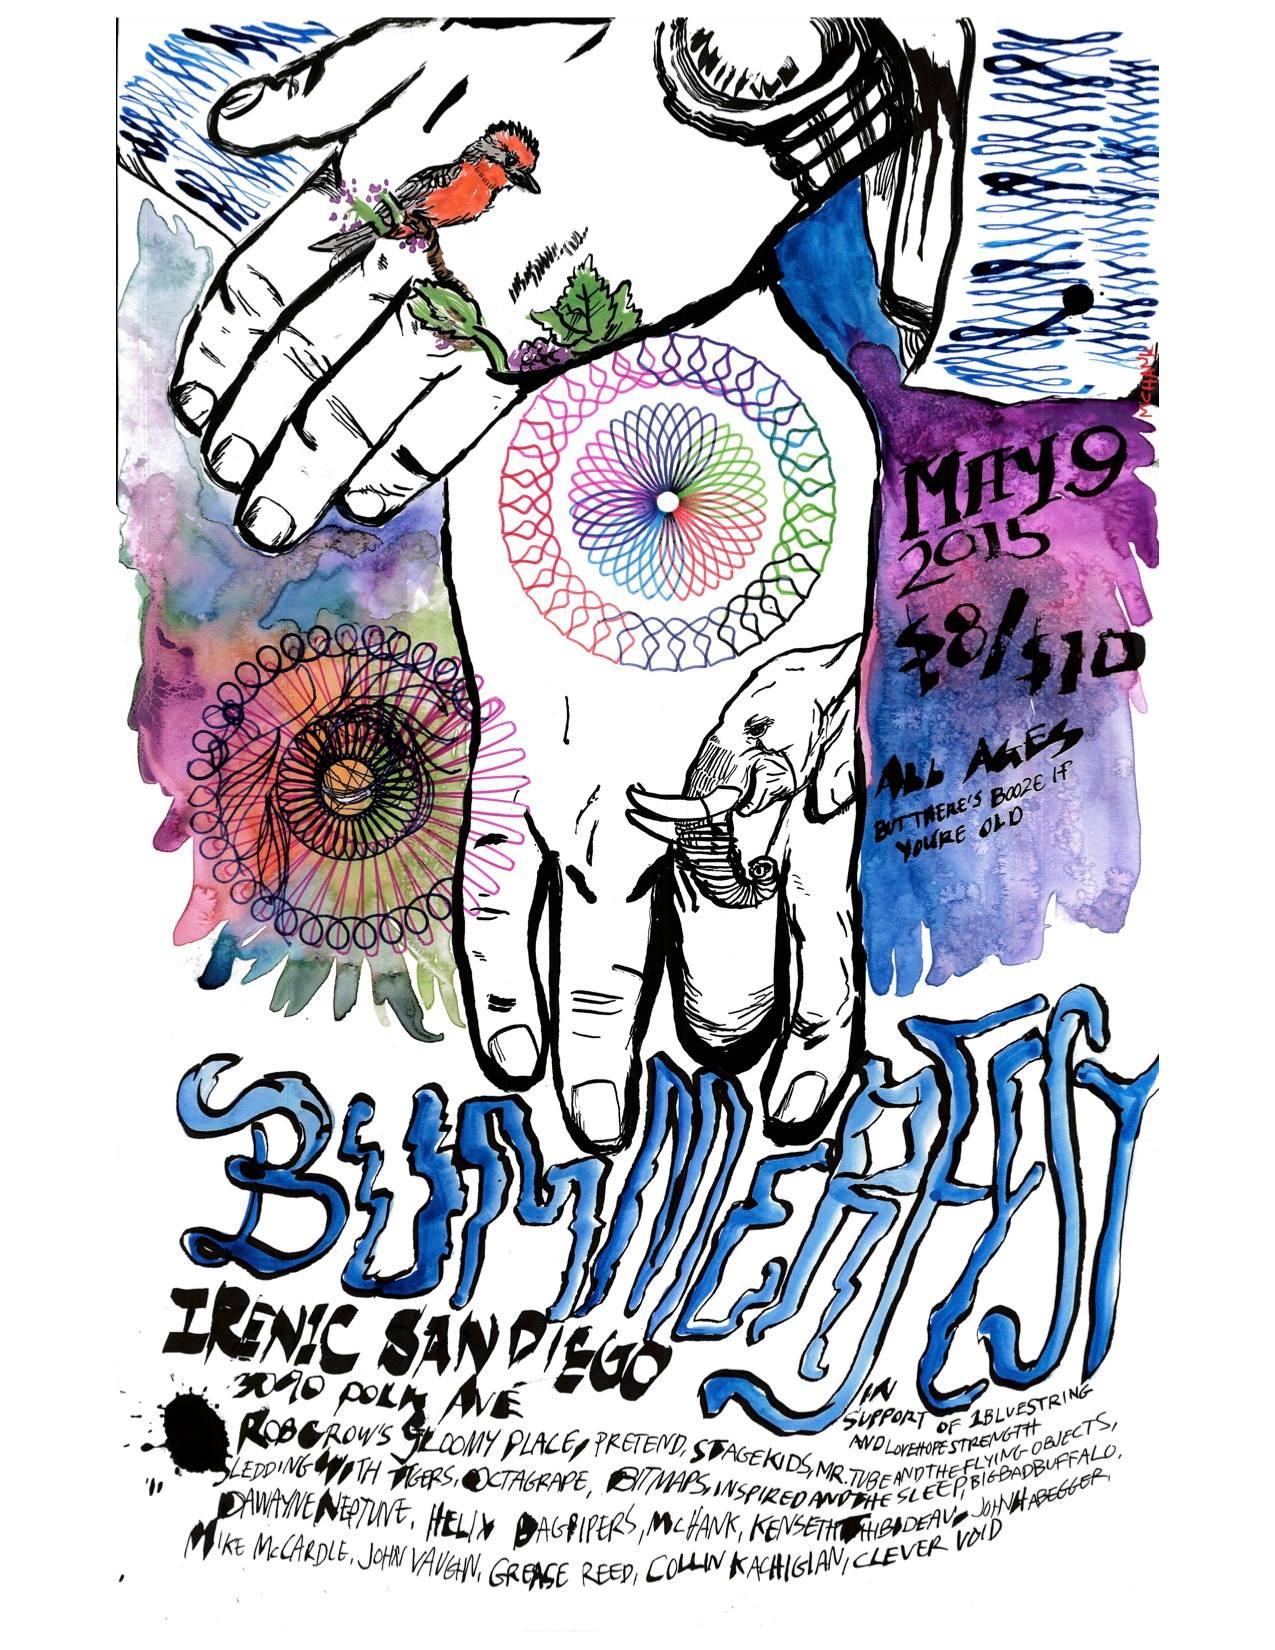 Bummerfest poster by McHank